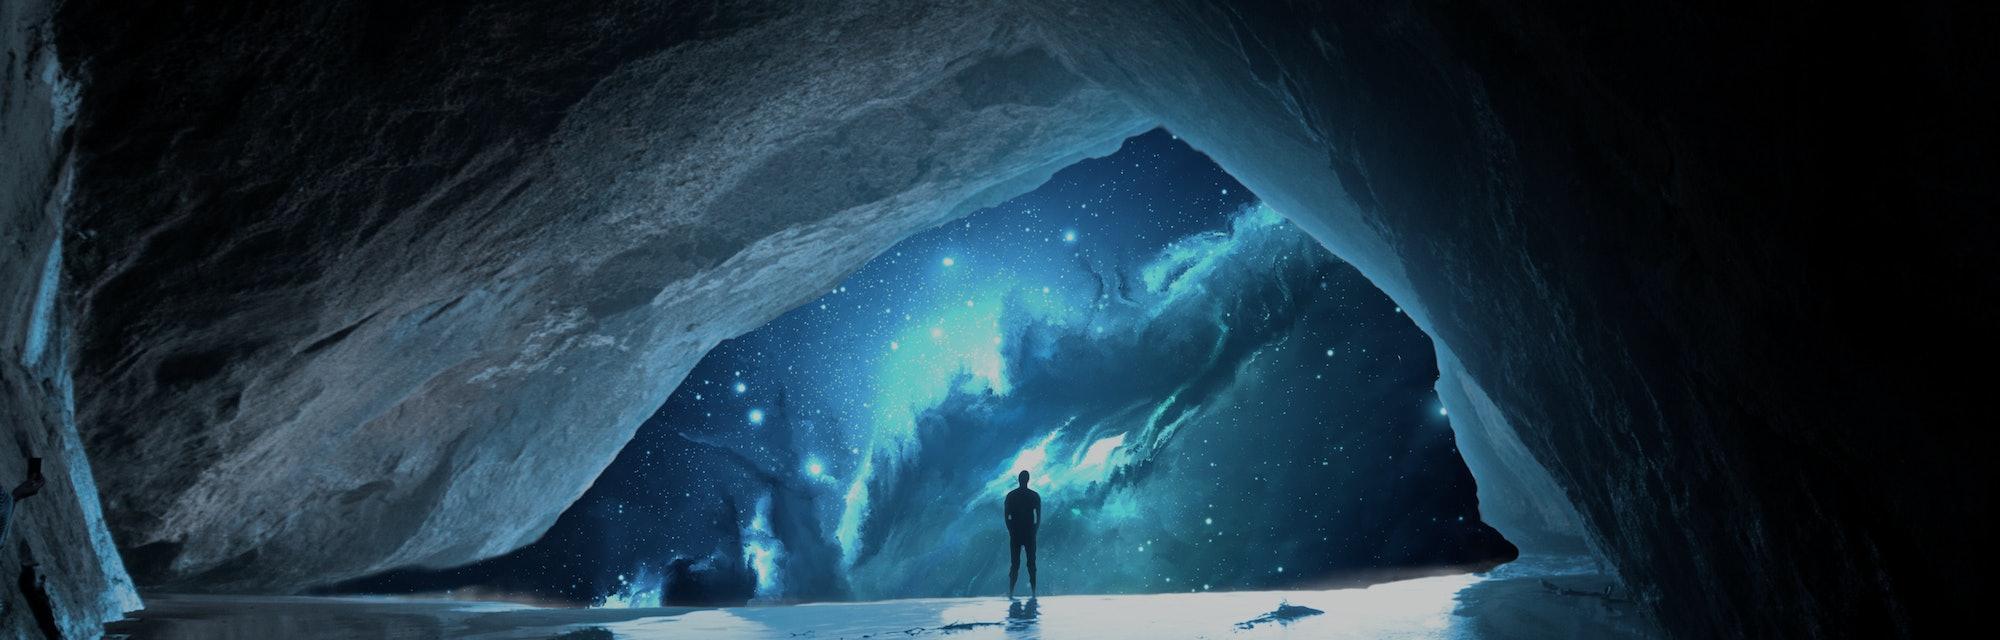 Ancient Places Backgrounds - Space Cavern